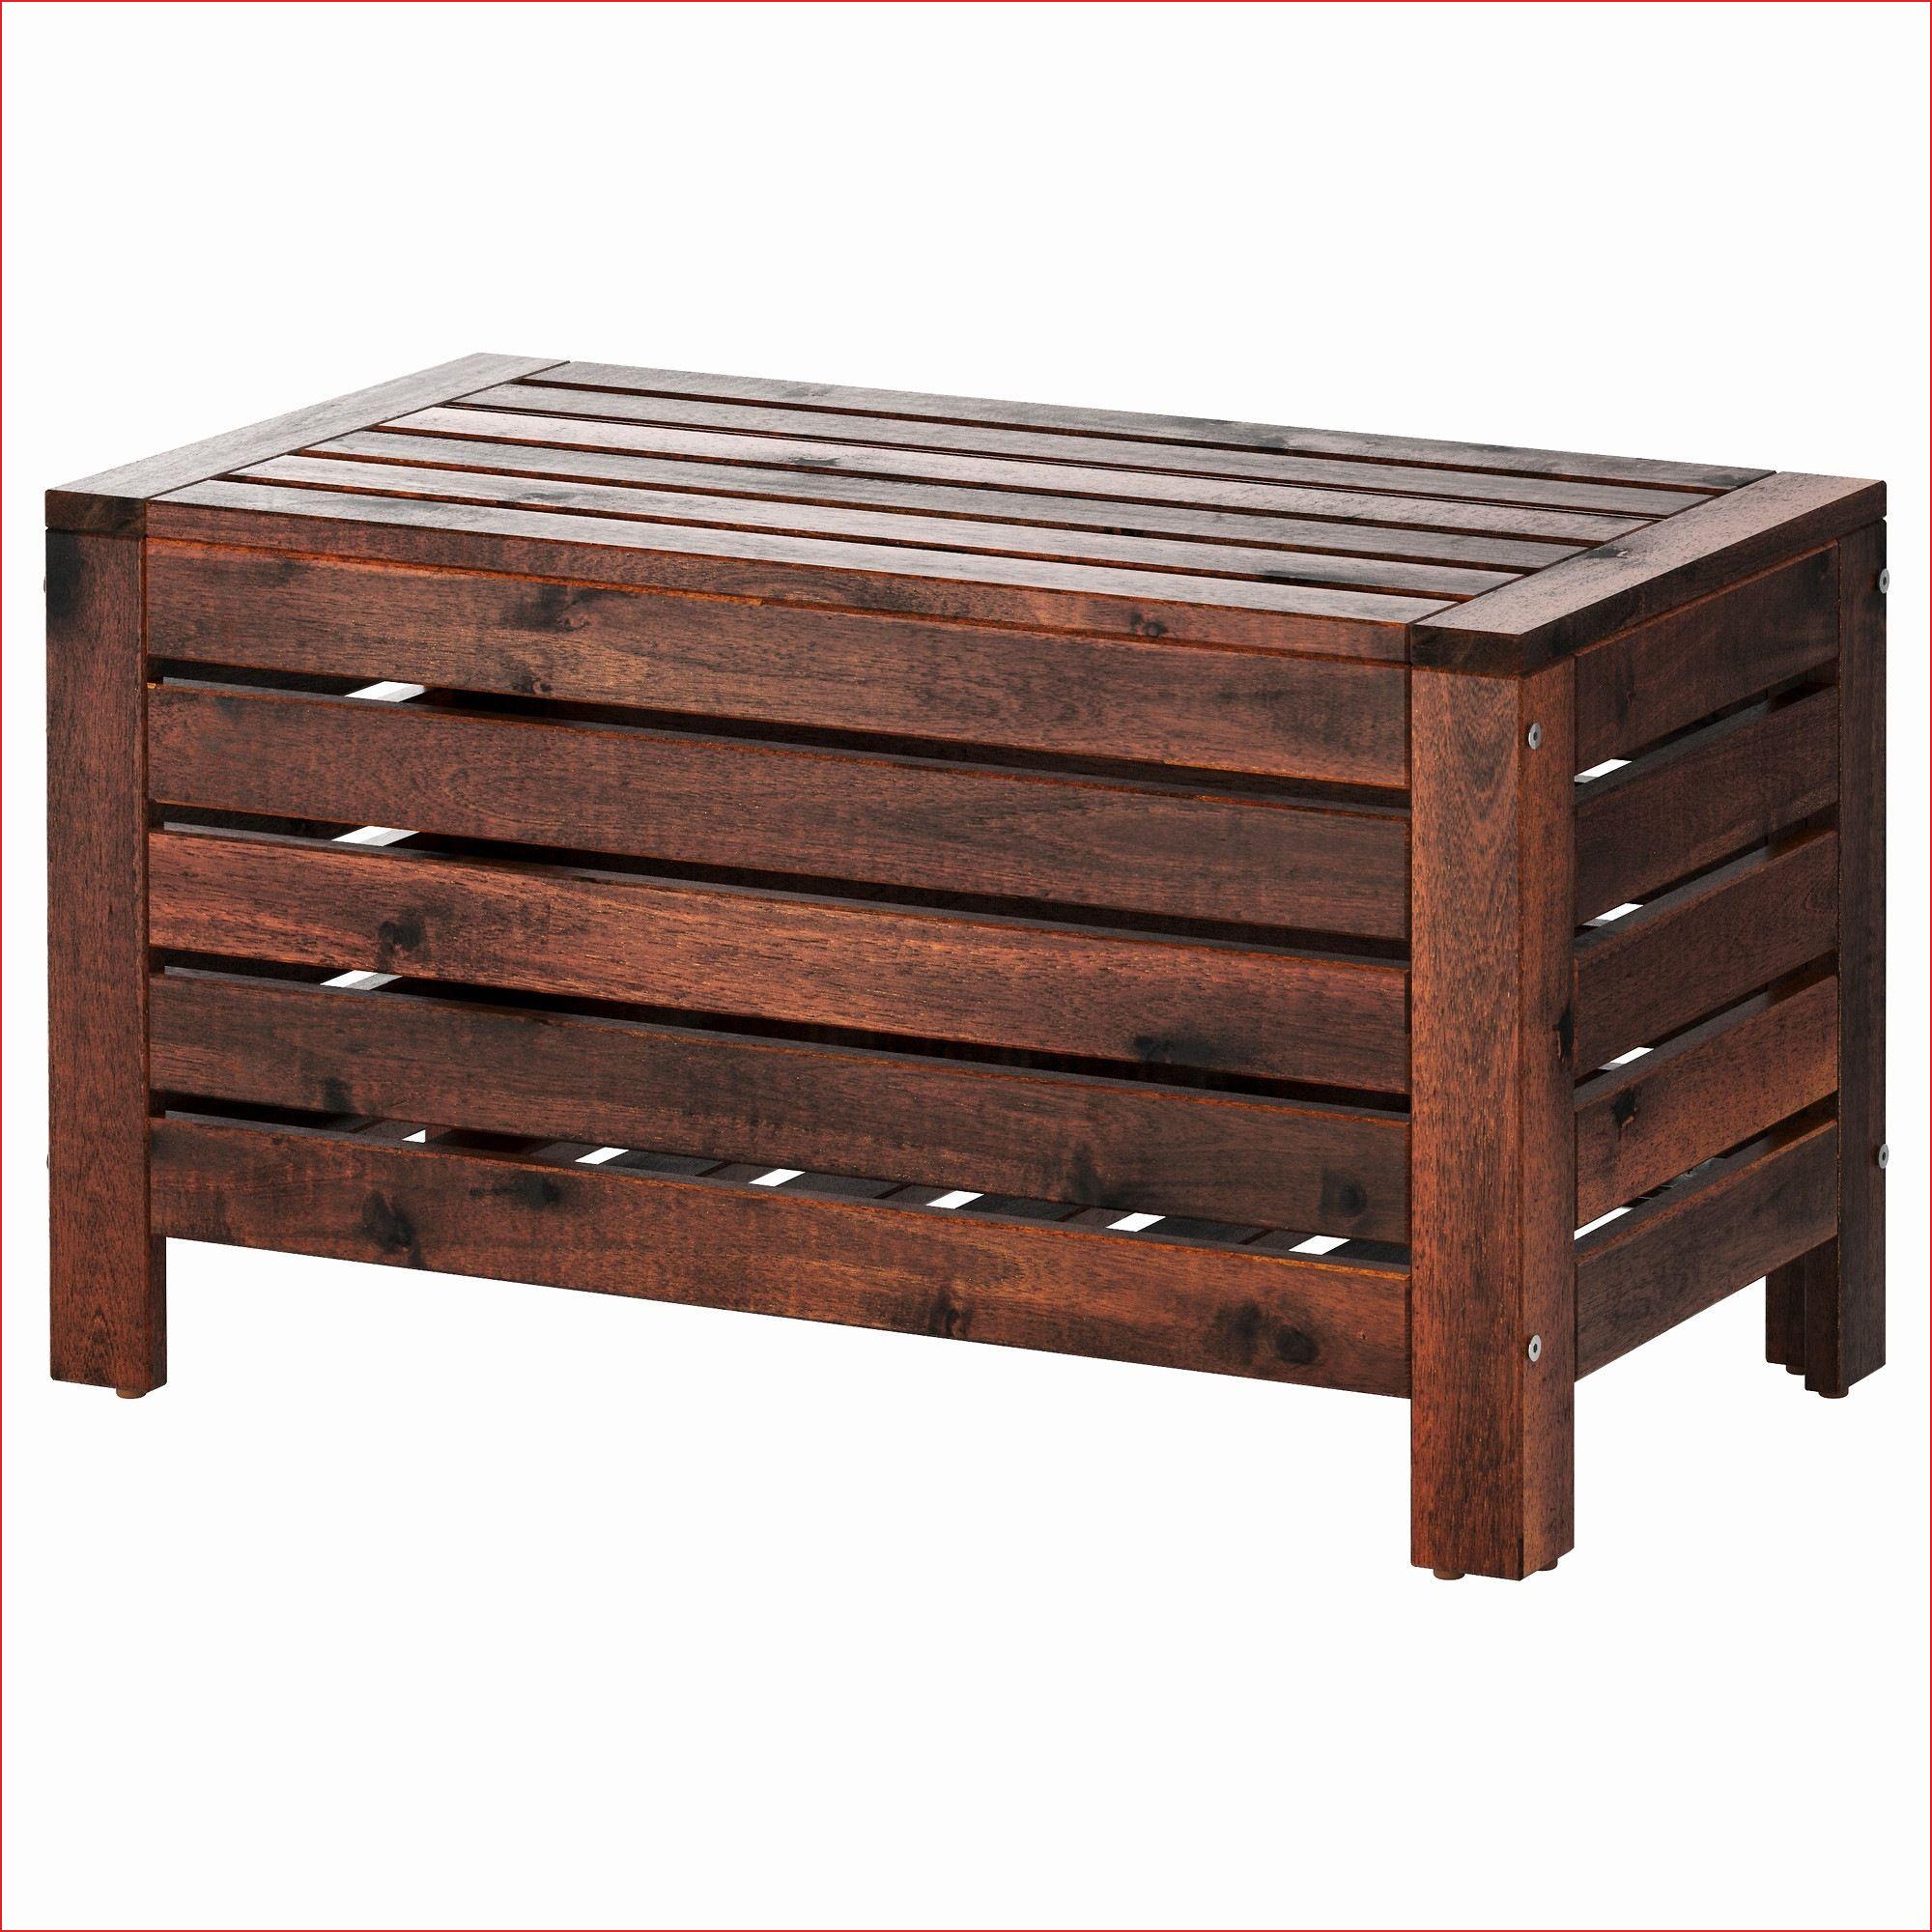 Prendre Un Coffre De Jardin Ikea Collection De Jardin Idée ... encequiconcerne Coffre Jardin Brico Depot